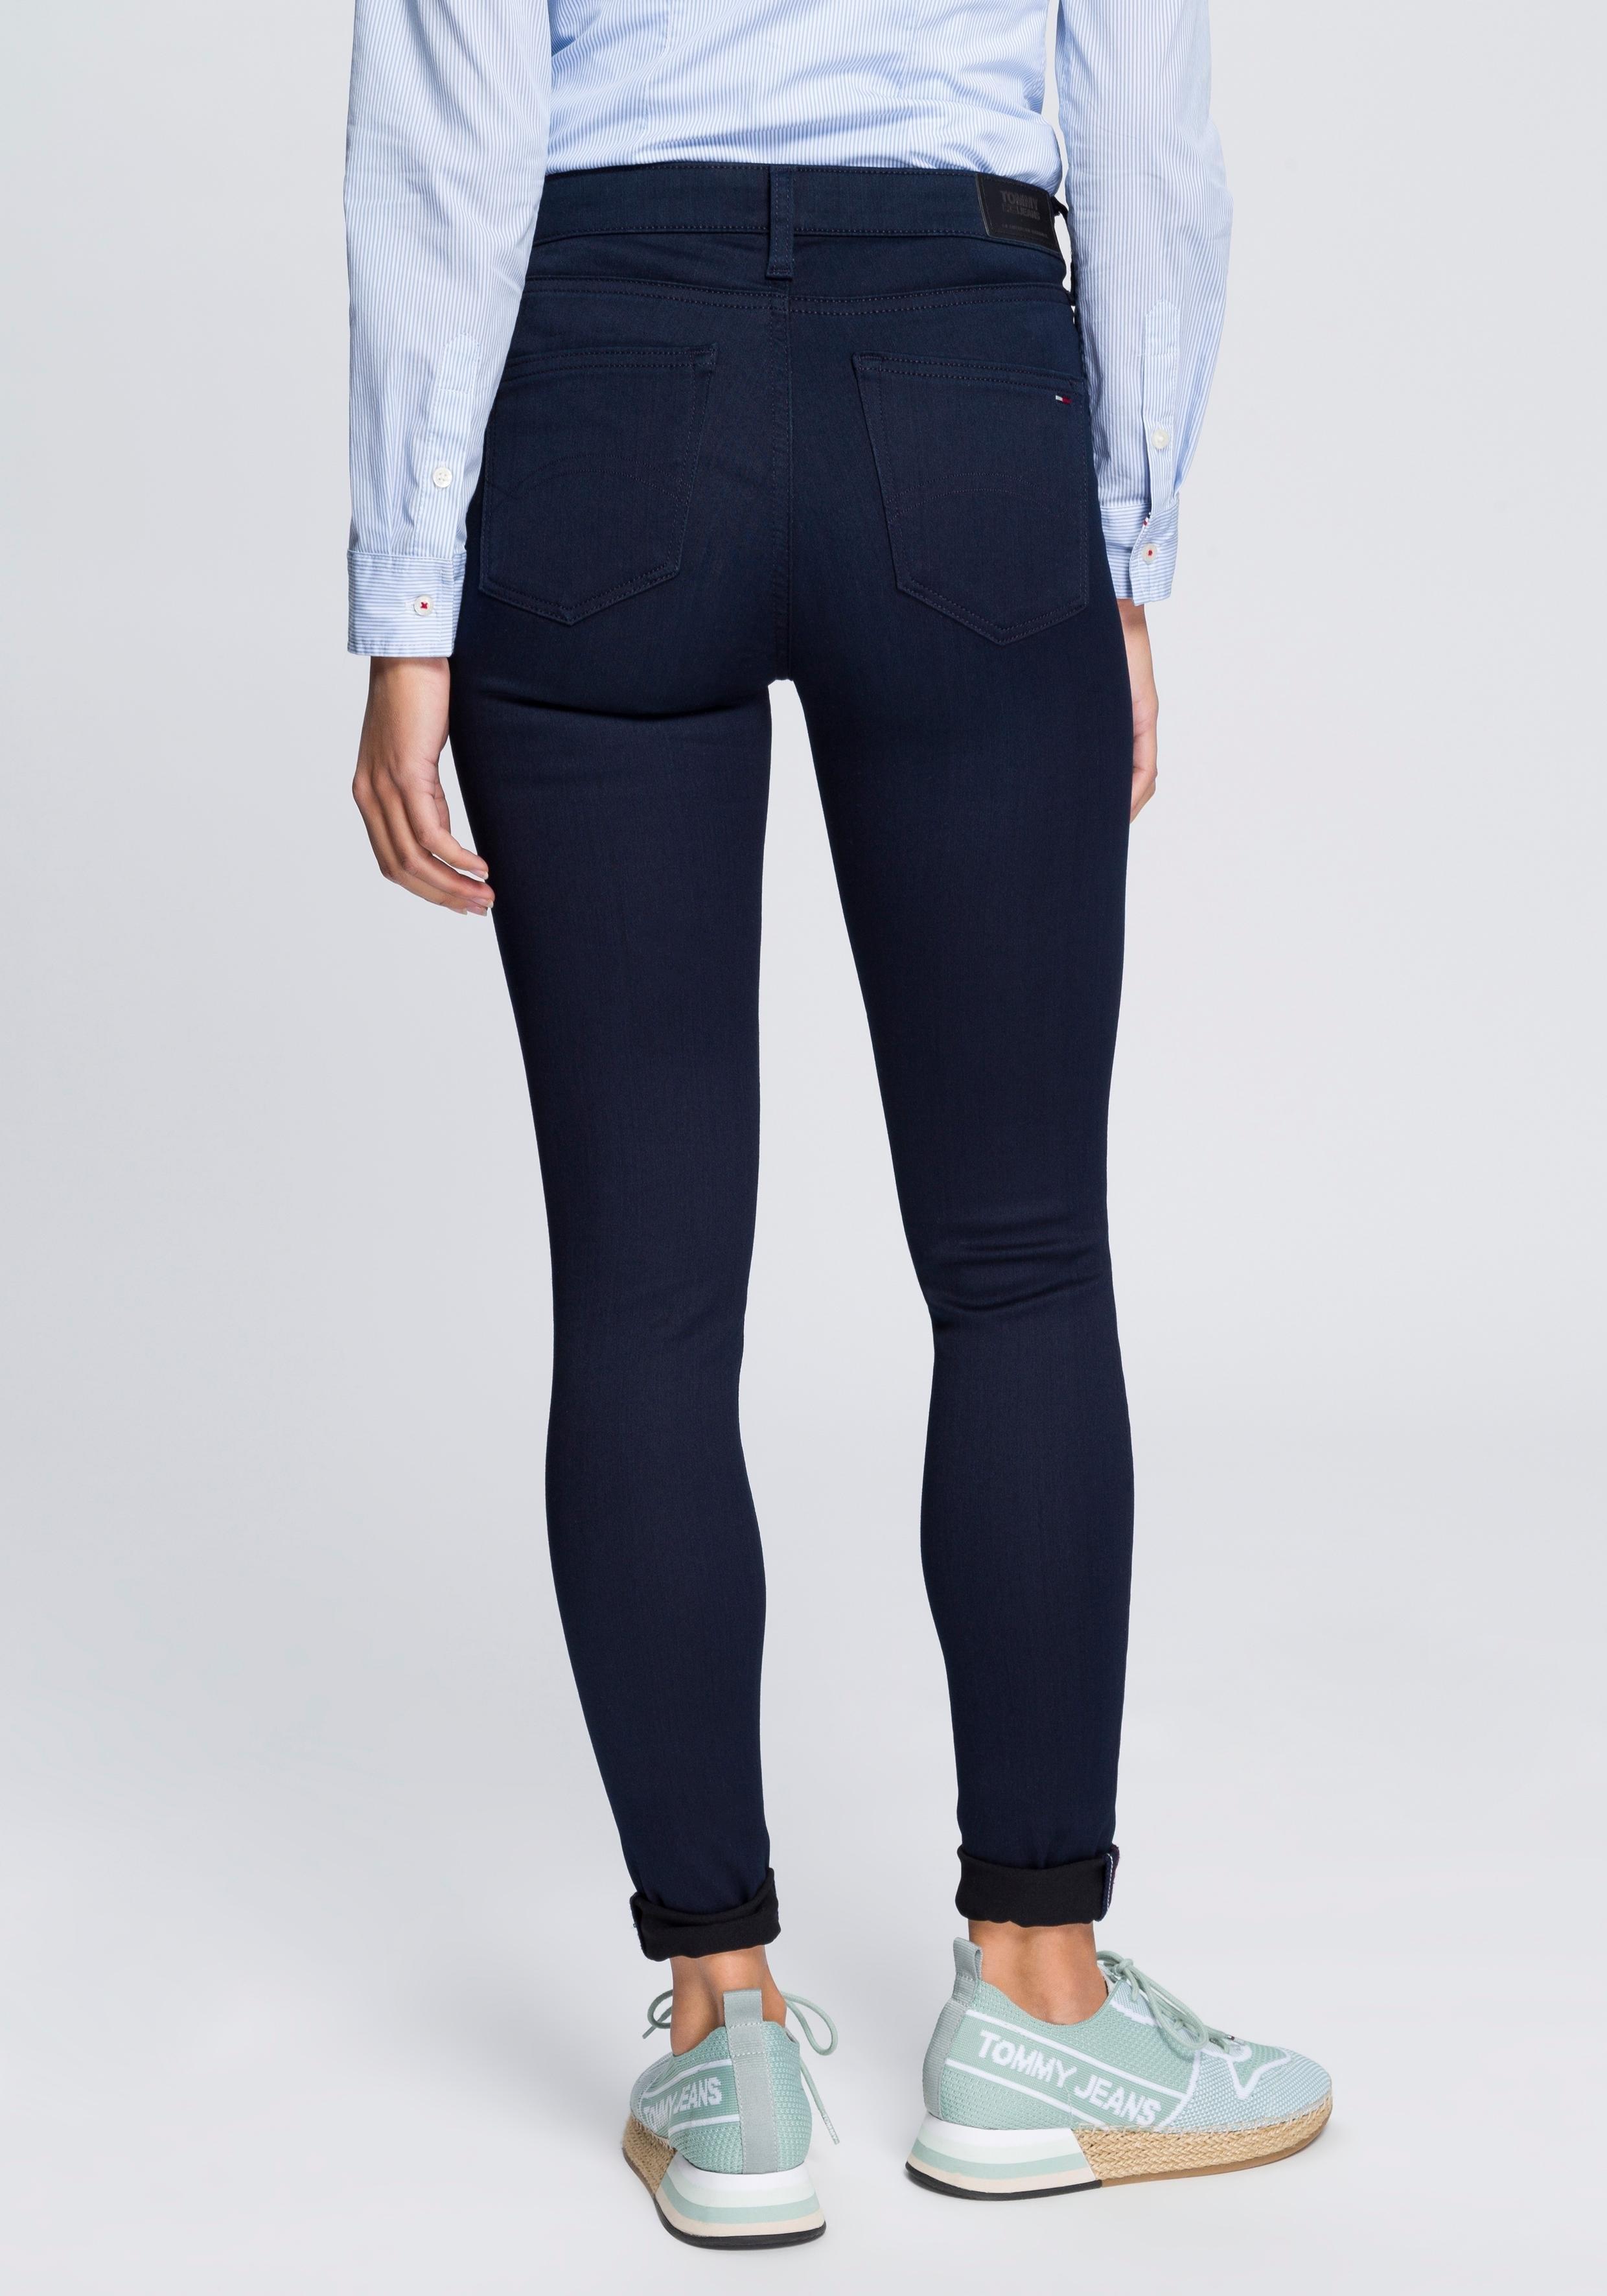 TOMMY JEANS jeans »MID RISE SKINNY NORA BGBST« - verschillende betaalmethodes